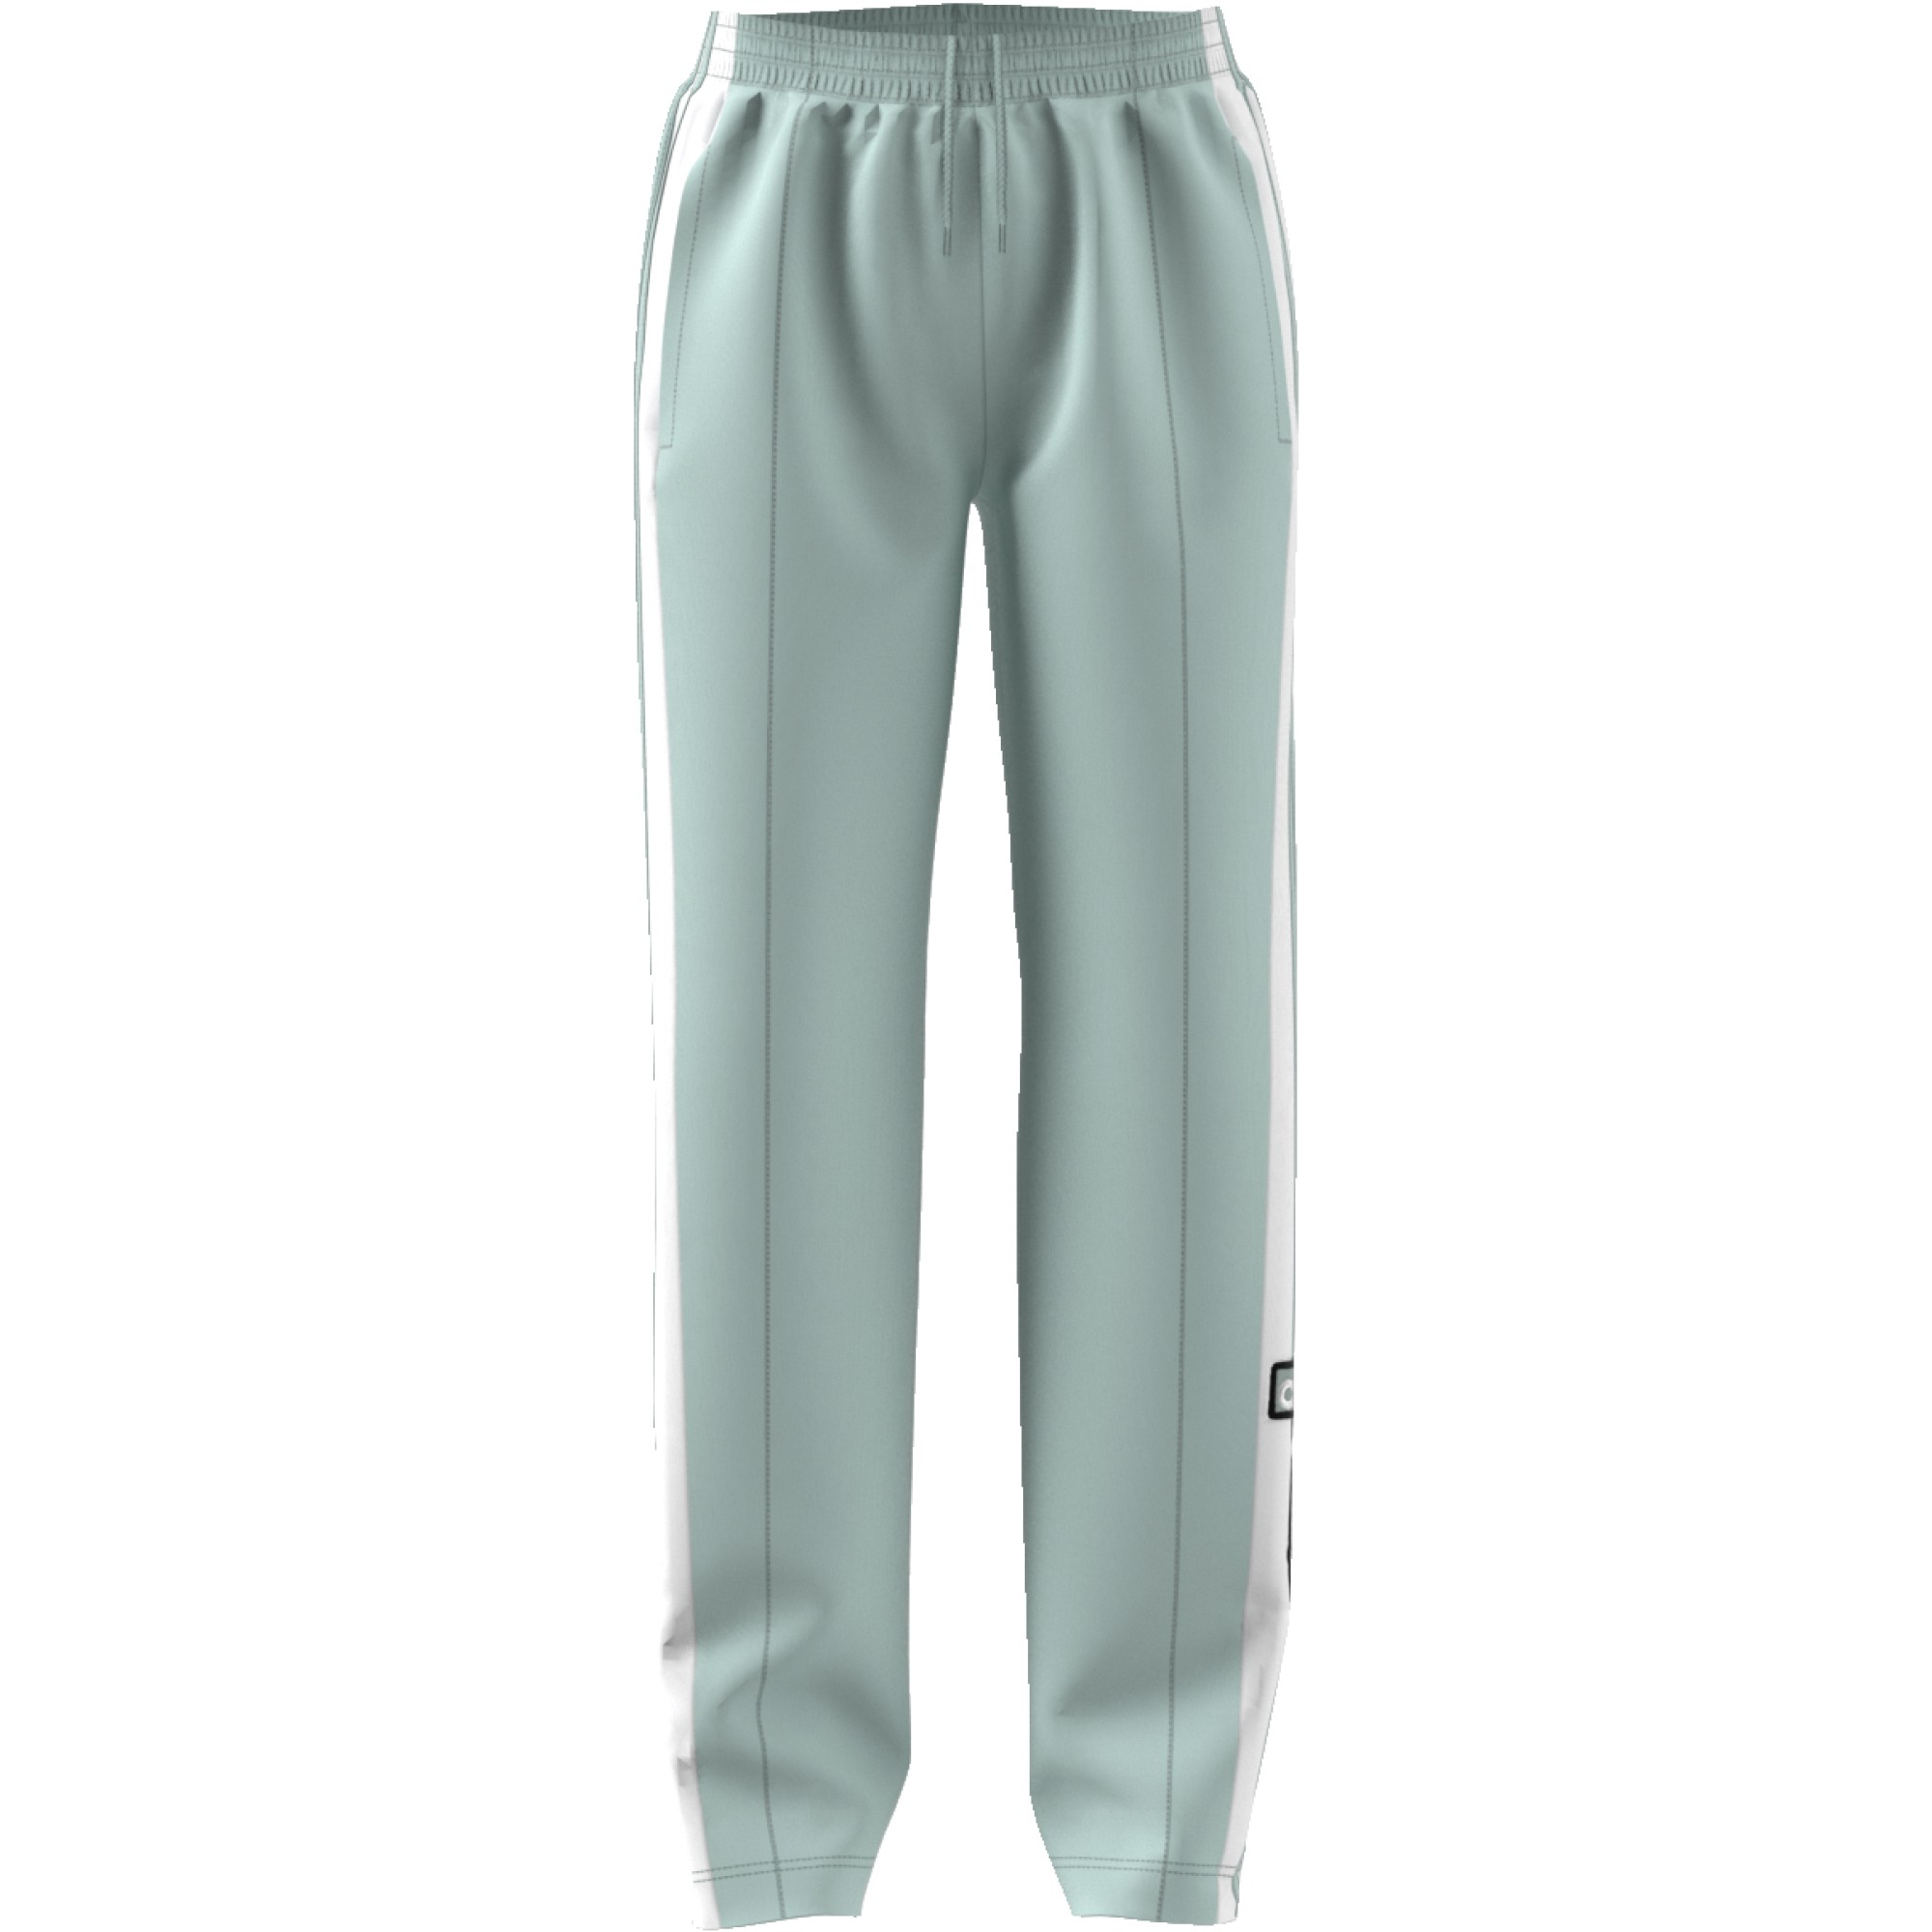 Azul Moya Mujer Adidas Adibreak Pantalón Deportes Claro 29YEWDIH